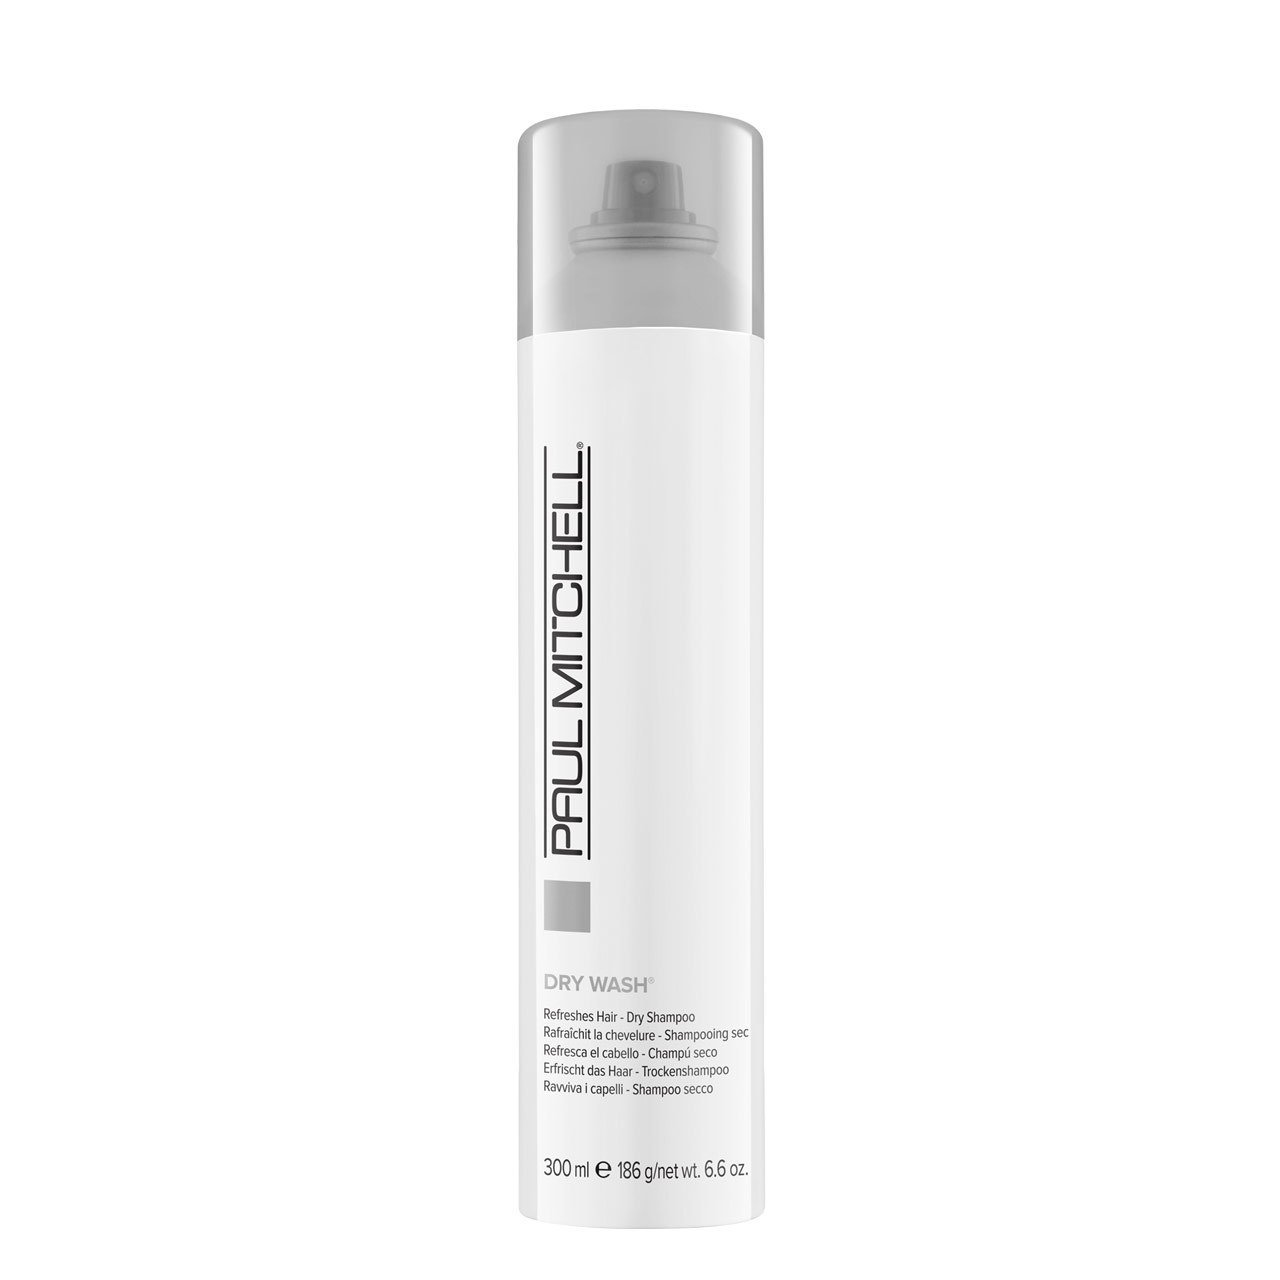 Paul Mitchell Express Dry Waterless Shampoo , 5.5 oz 009531120409